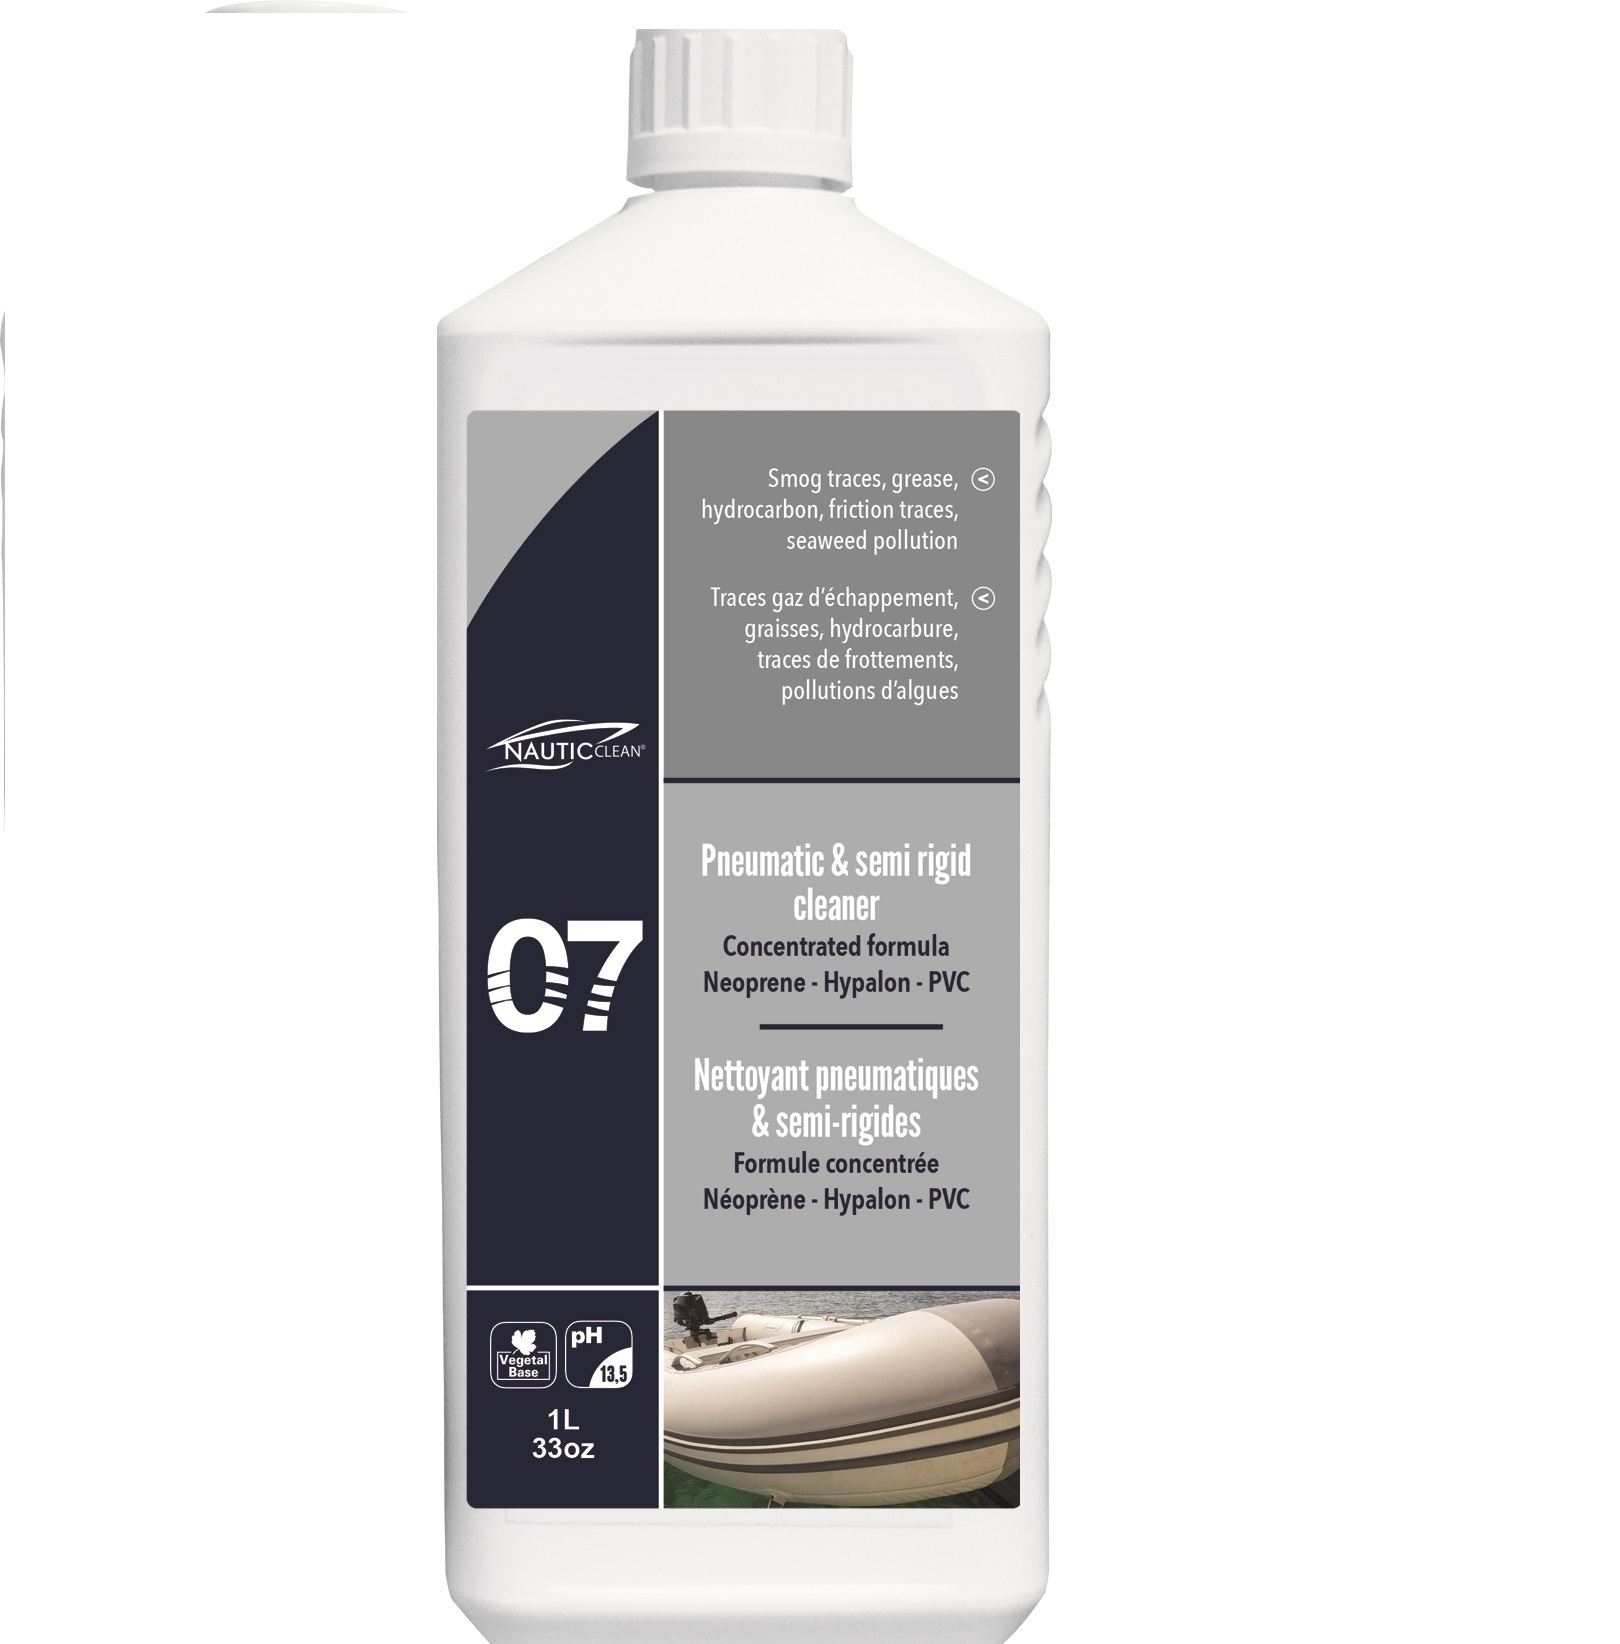 Propertie of Pneumatic & semi-rigid cleaner №07